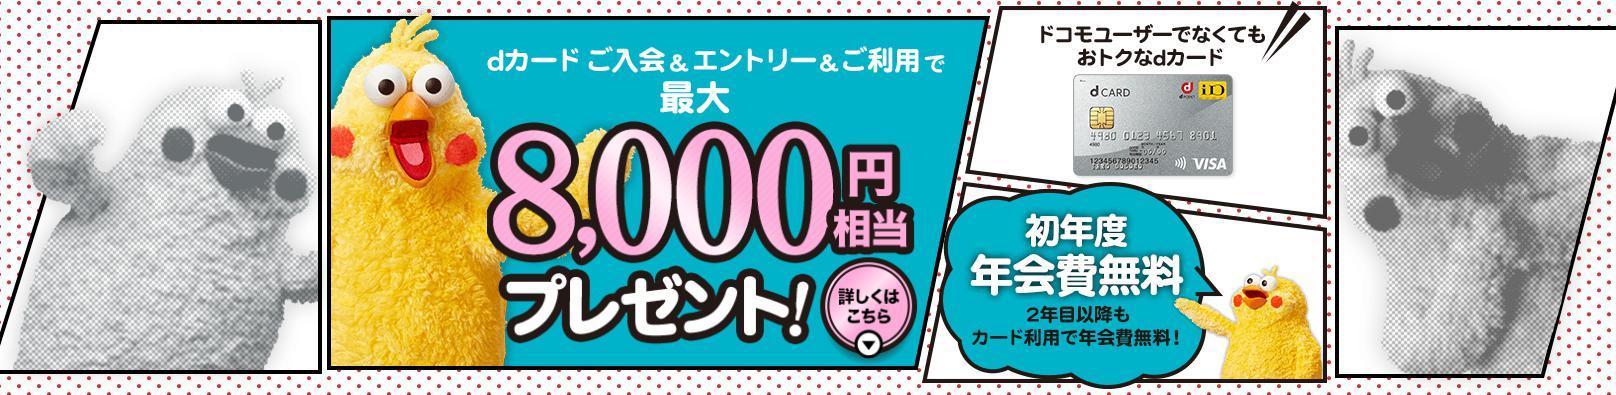 dカード入会キャンペーン